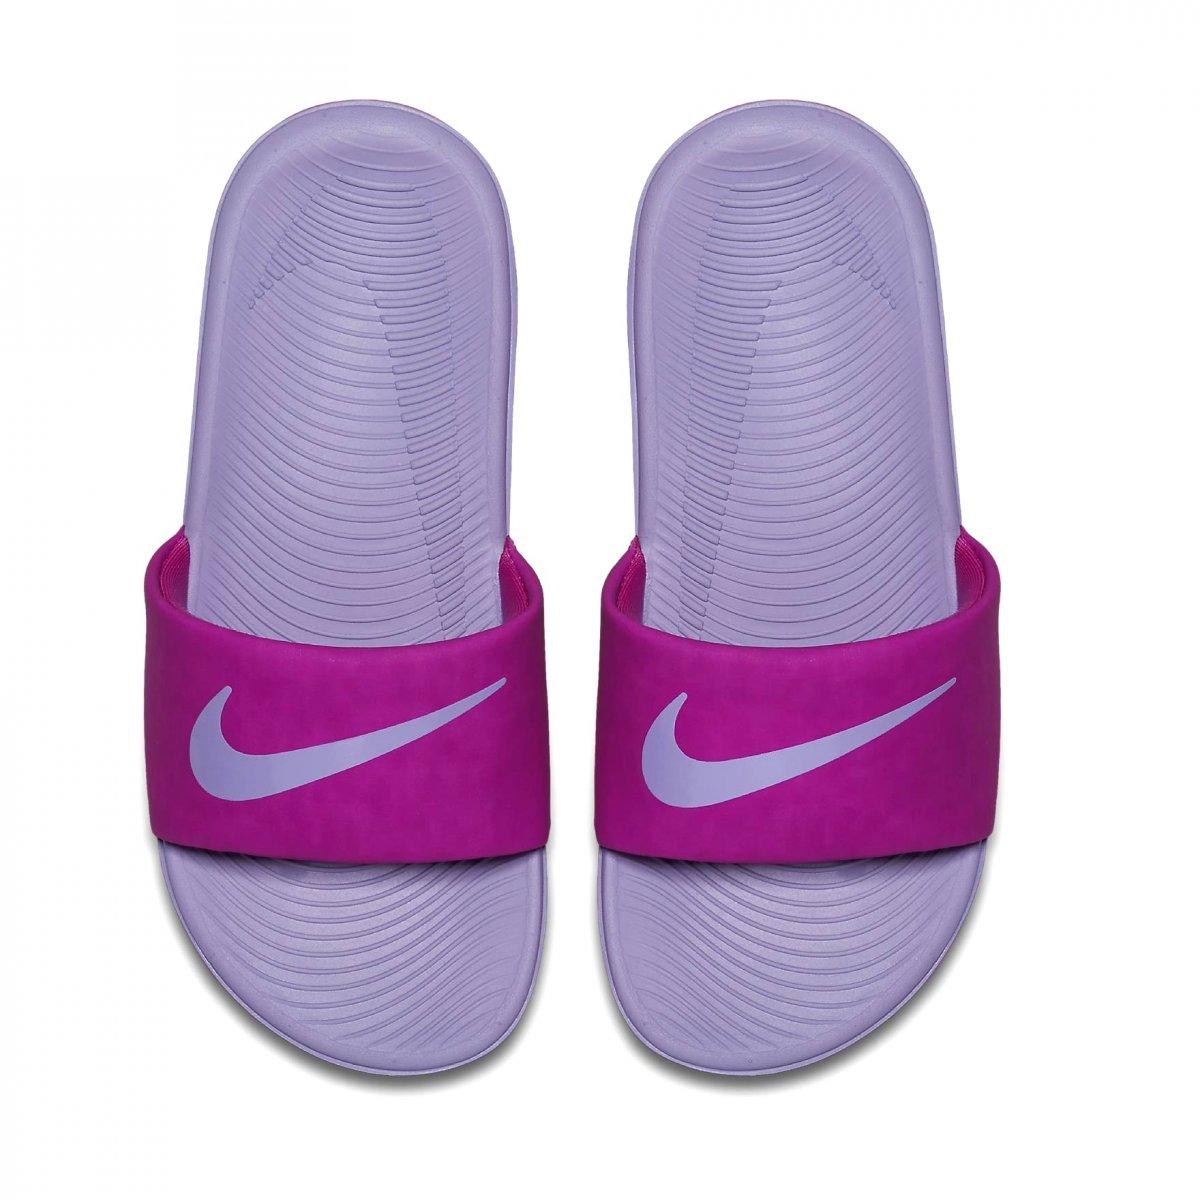 dc9b4f0e236 Sandália Infantil Nike Kawa Slide 819353-601 - Roxo - Botas Online ...